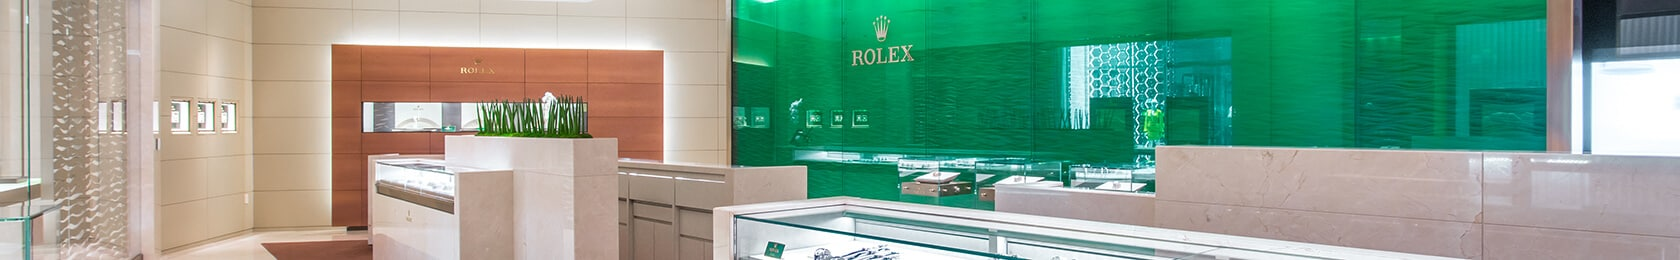 Rolex In-Store Banner